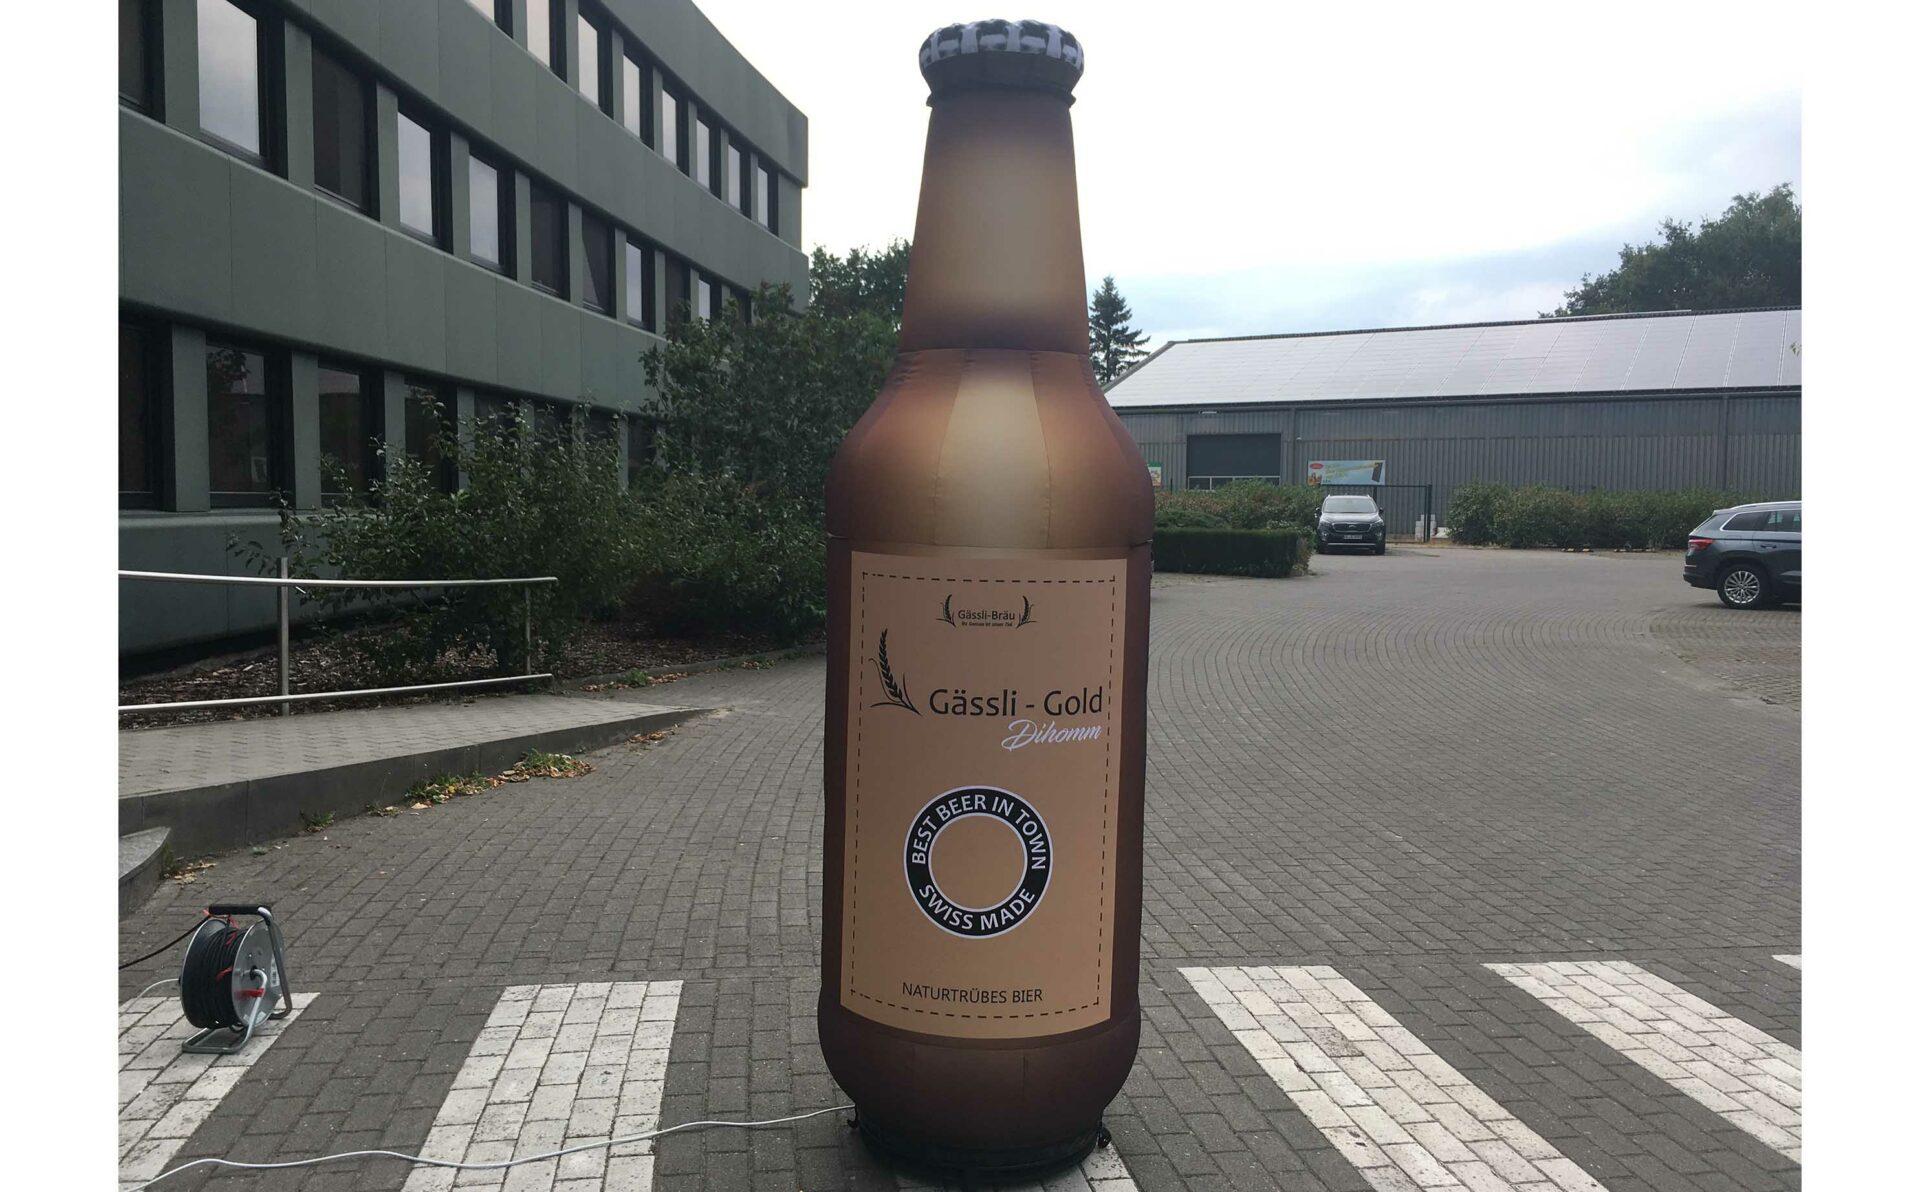 inflatable beer bottle